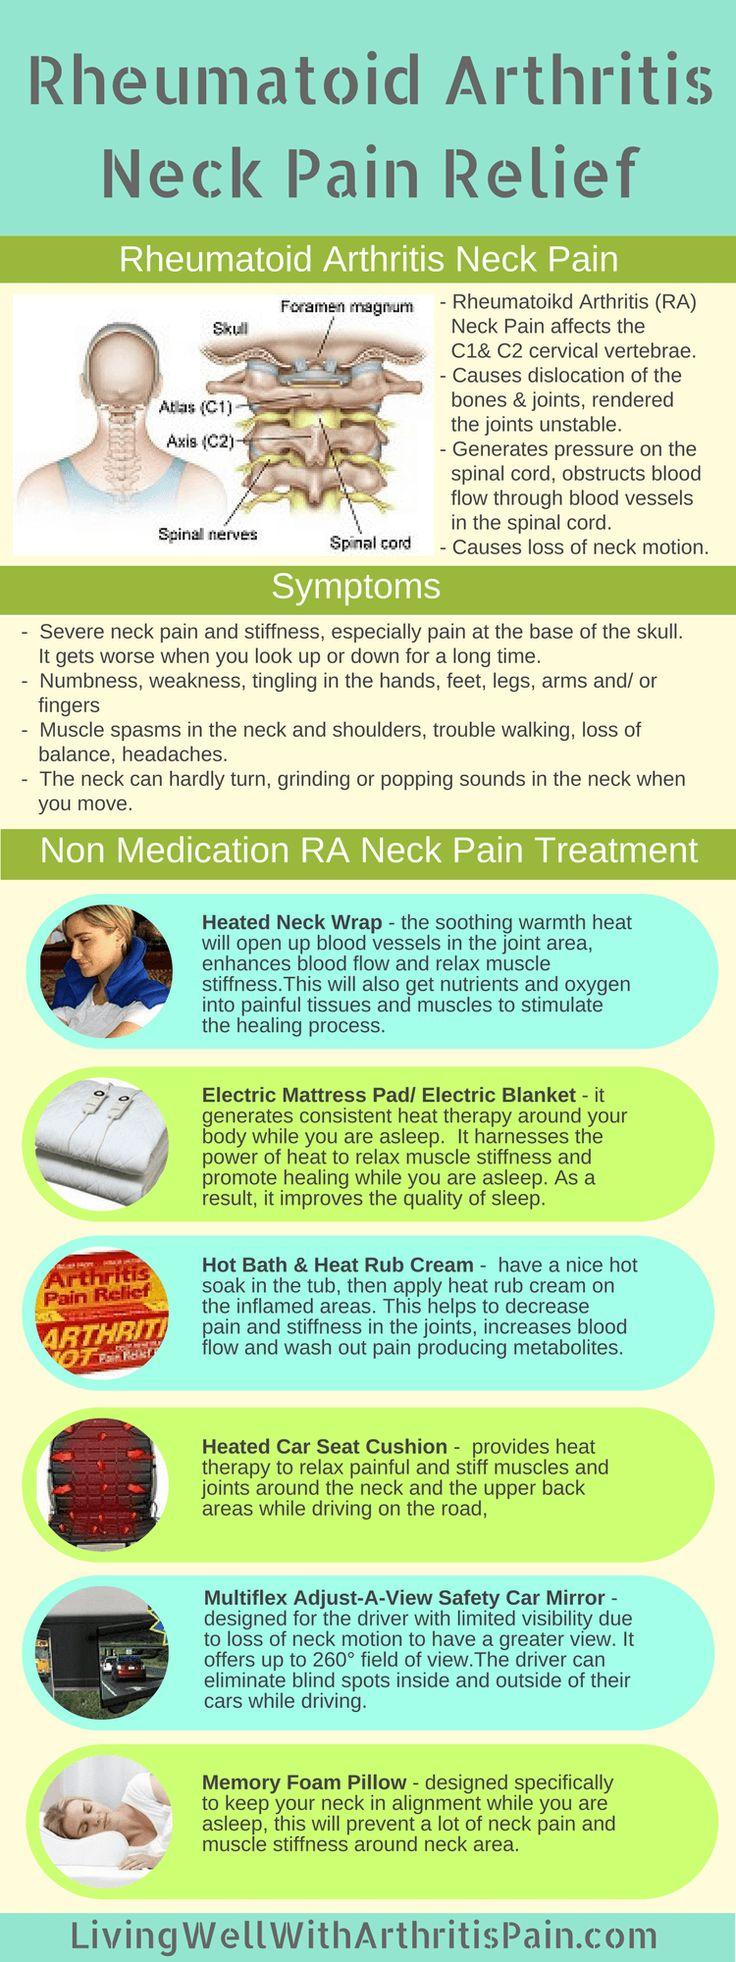 Joy Seat Lower Back Pain Relief Memory Foam Cushion Now